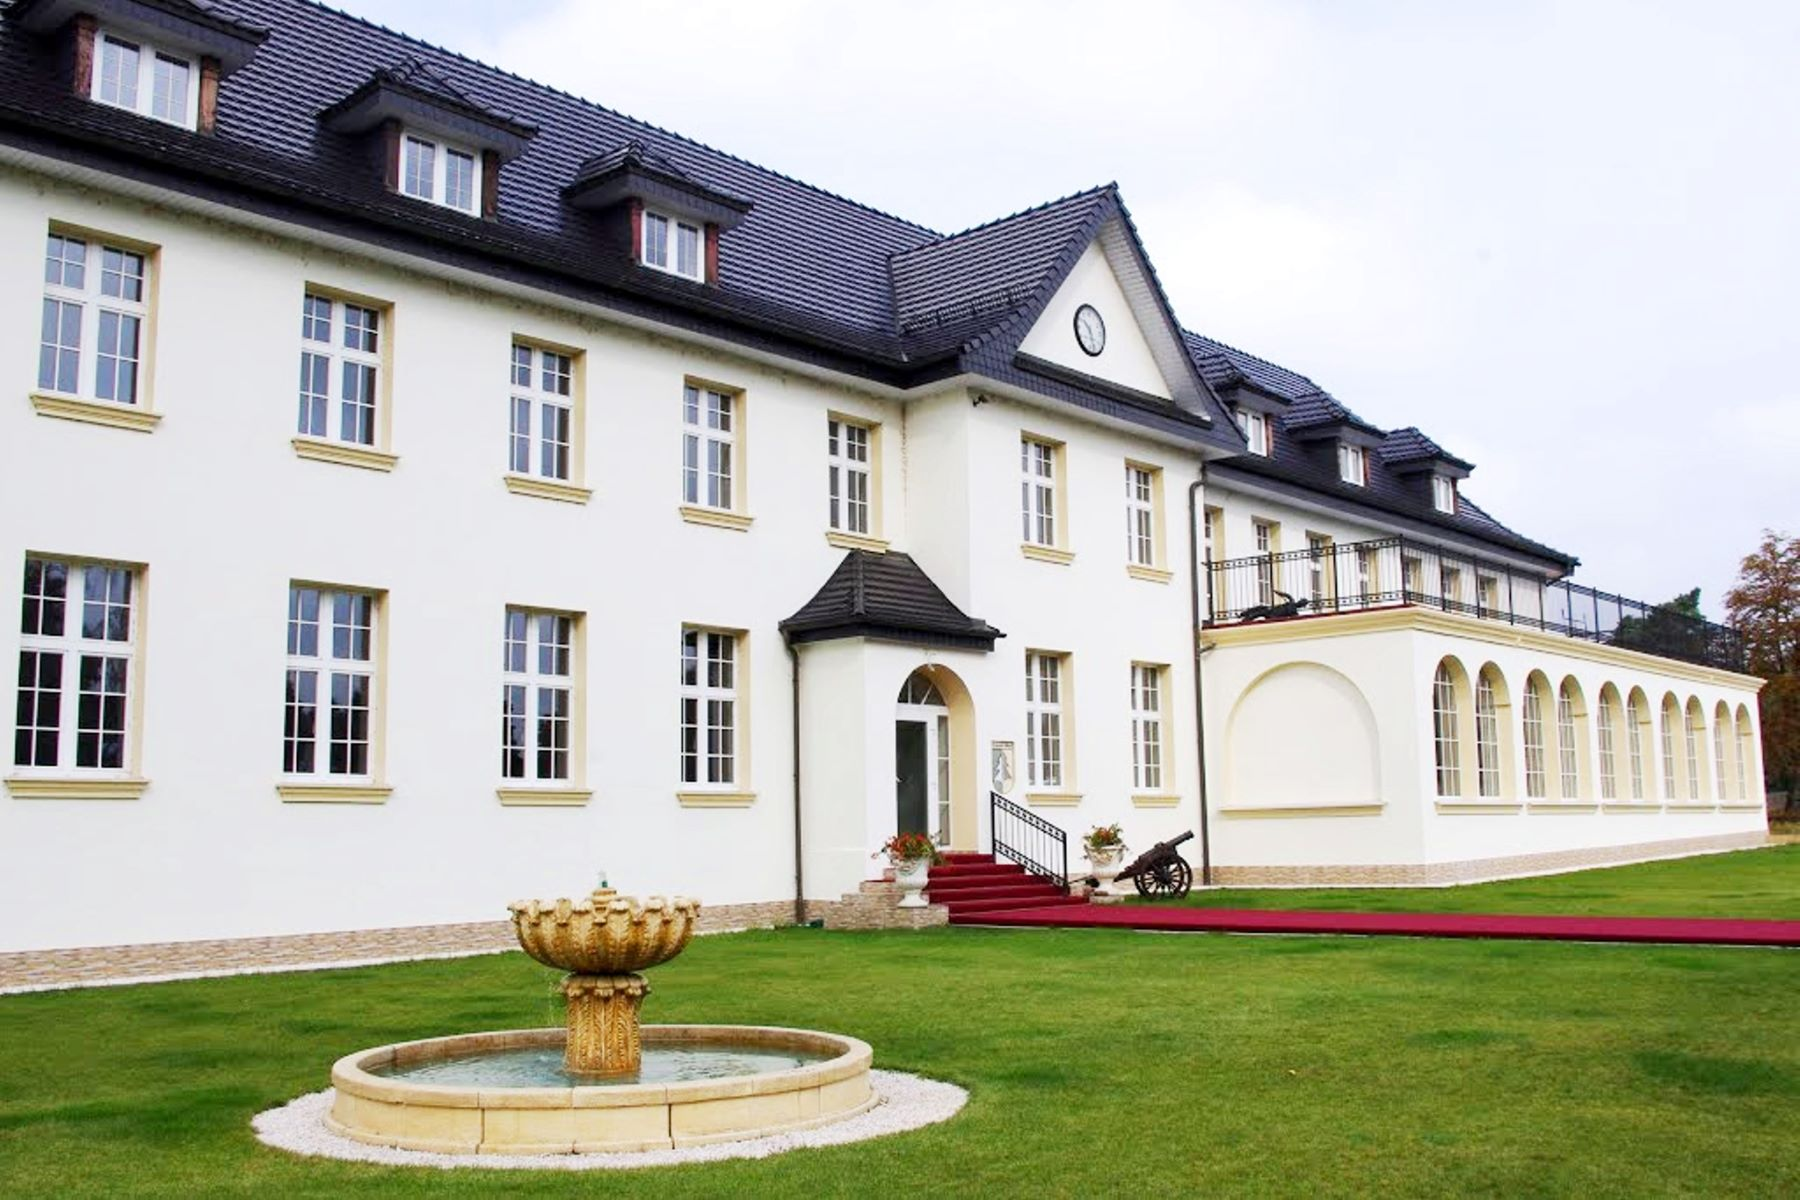 Other Residential Homes για την Πώληση στο Prawdzic Palace Other Poland, Αλλεσ Περιοχεσ Στην Πολωνια Πολωνια